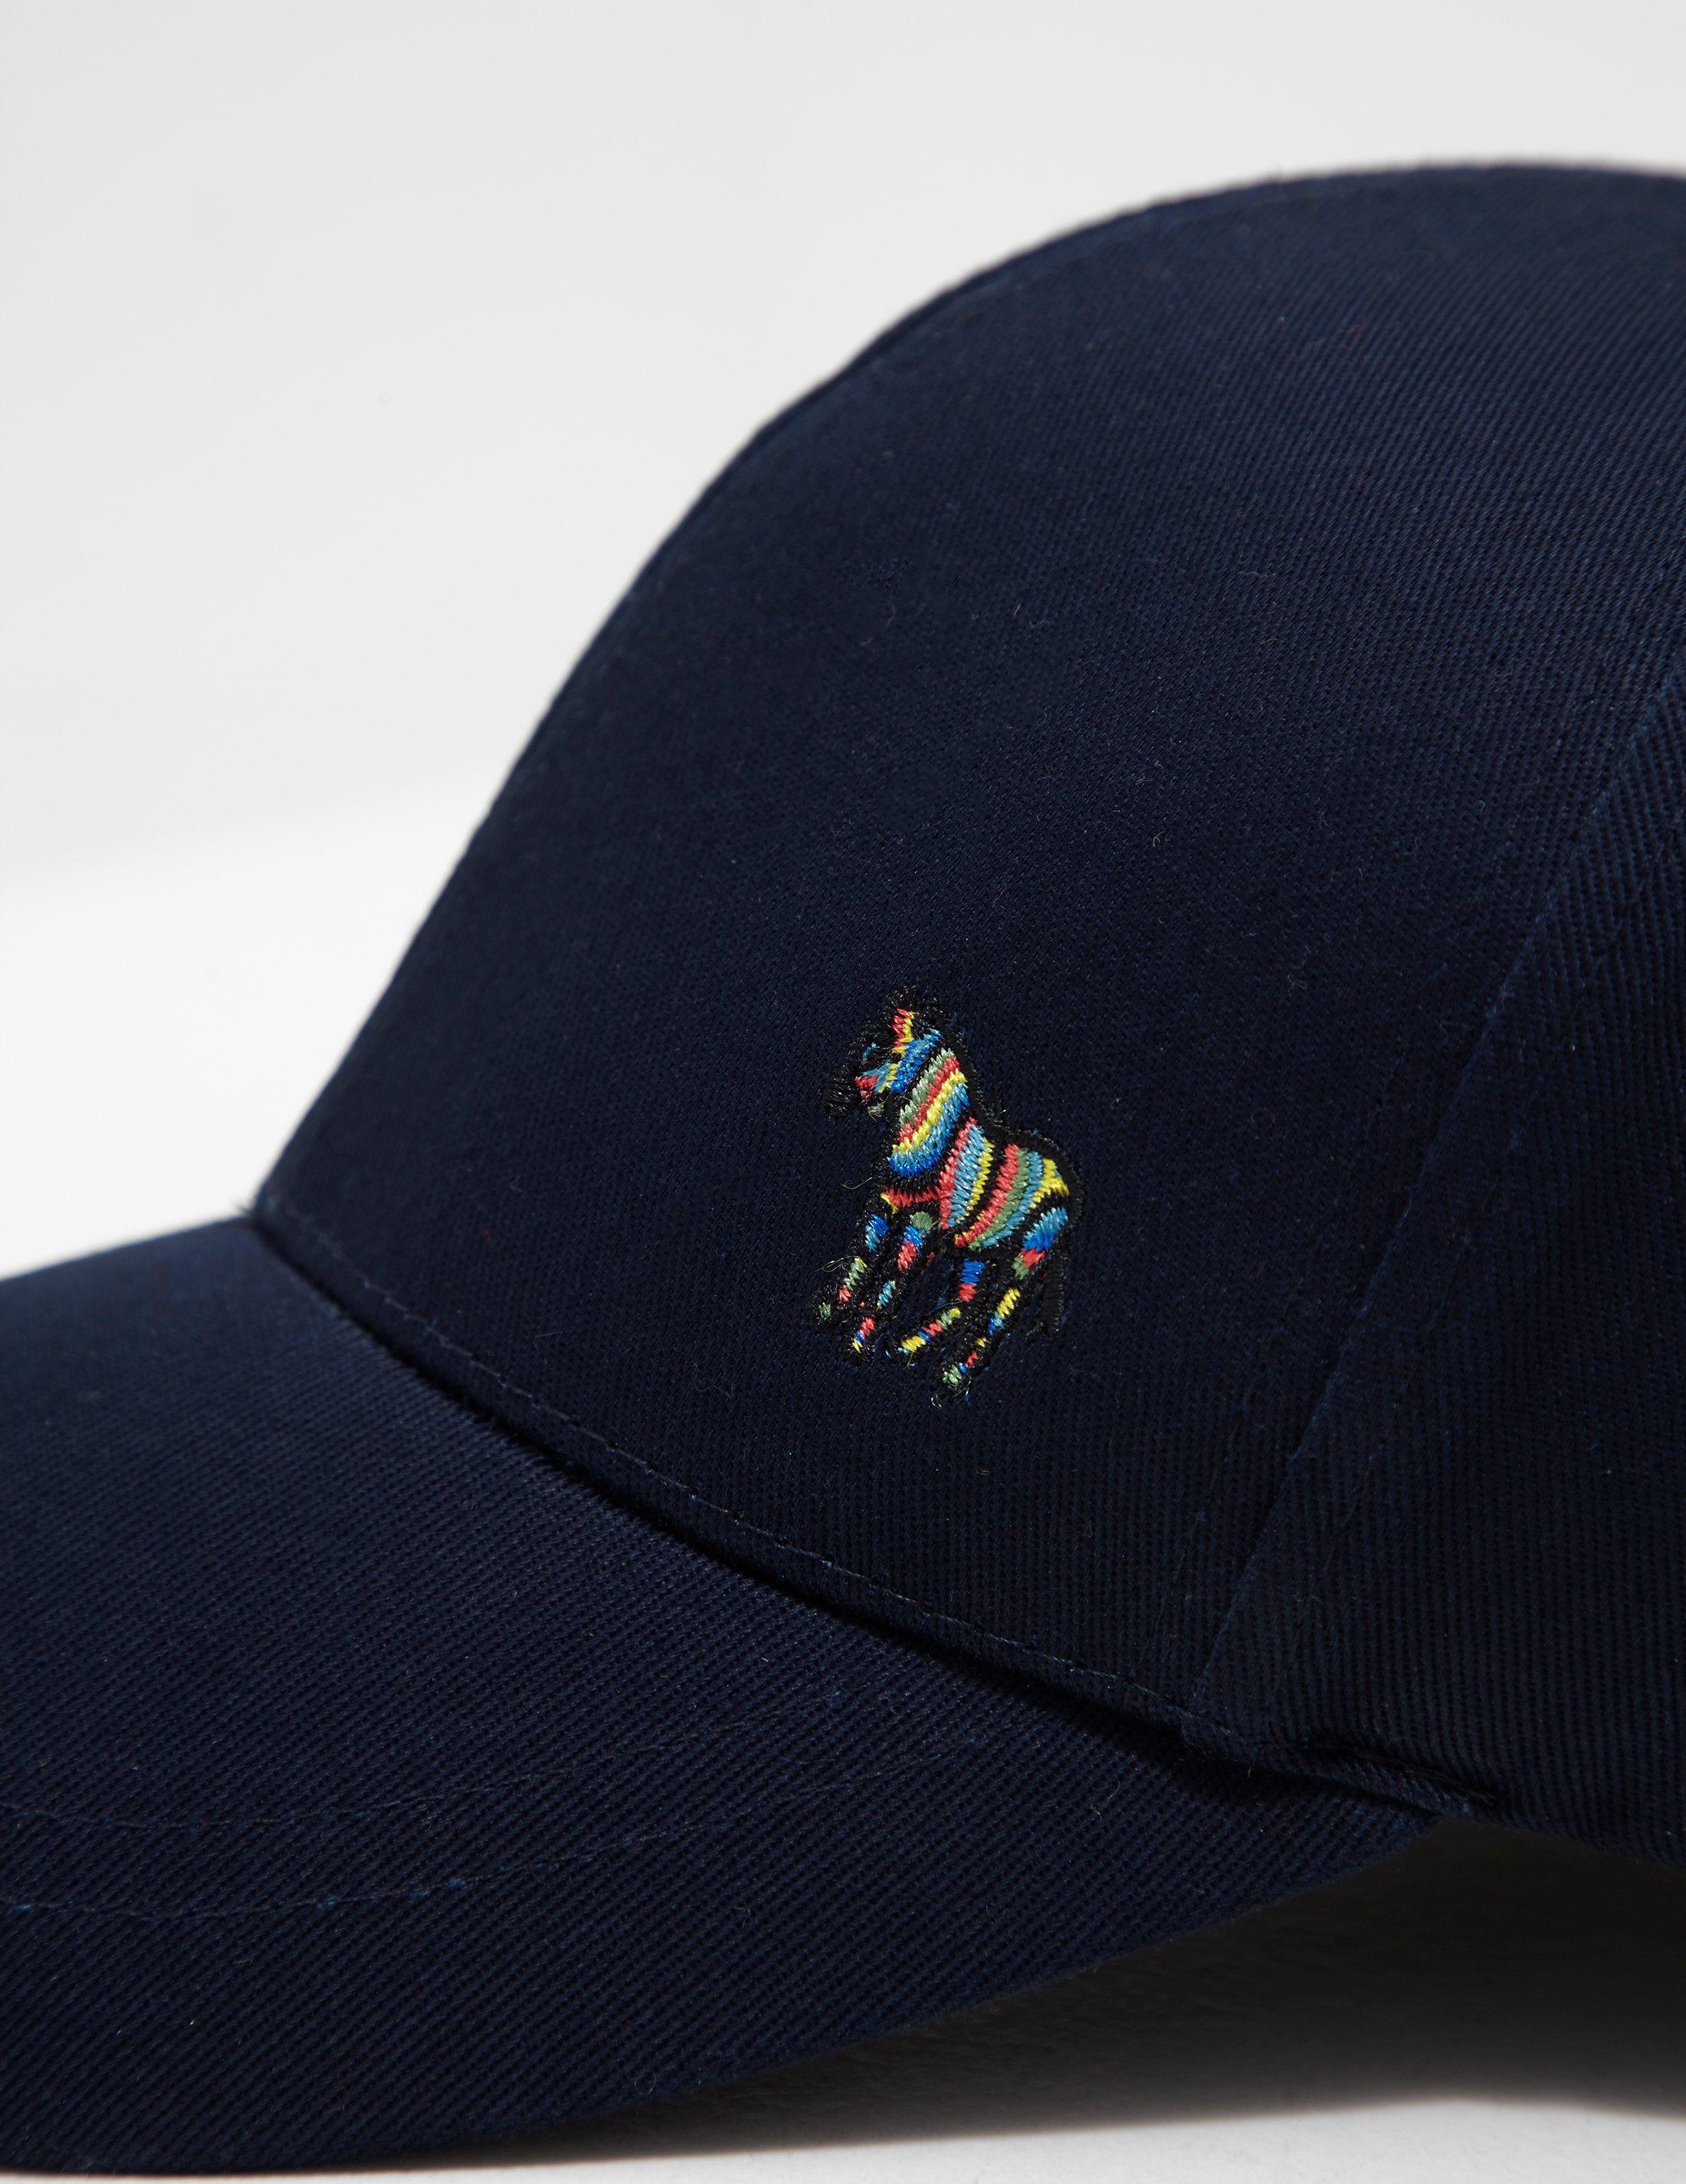 b2fa8ba4f7a593 PS by Paul Smith Mens Zebra Cap Navy Blue in Blue for Men - Lyst